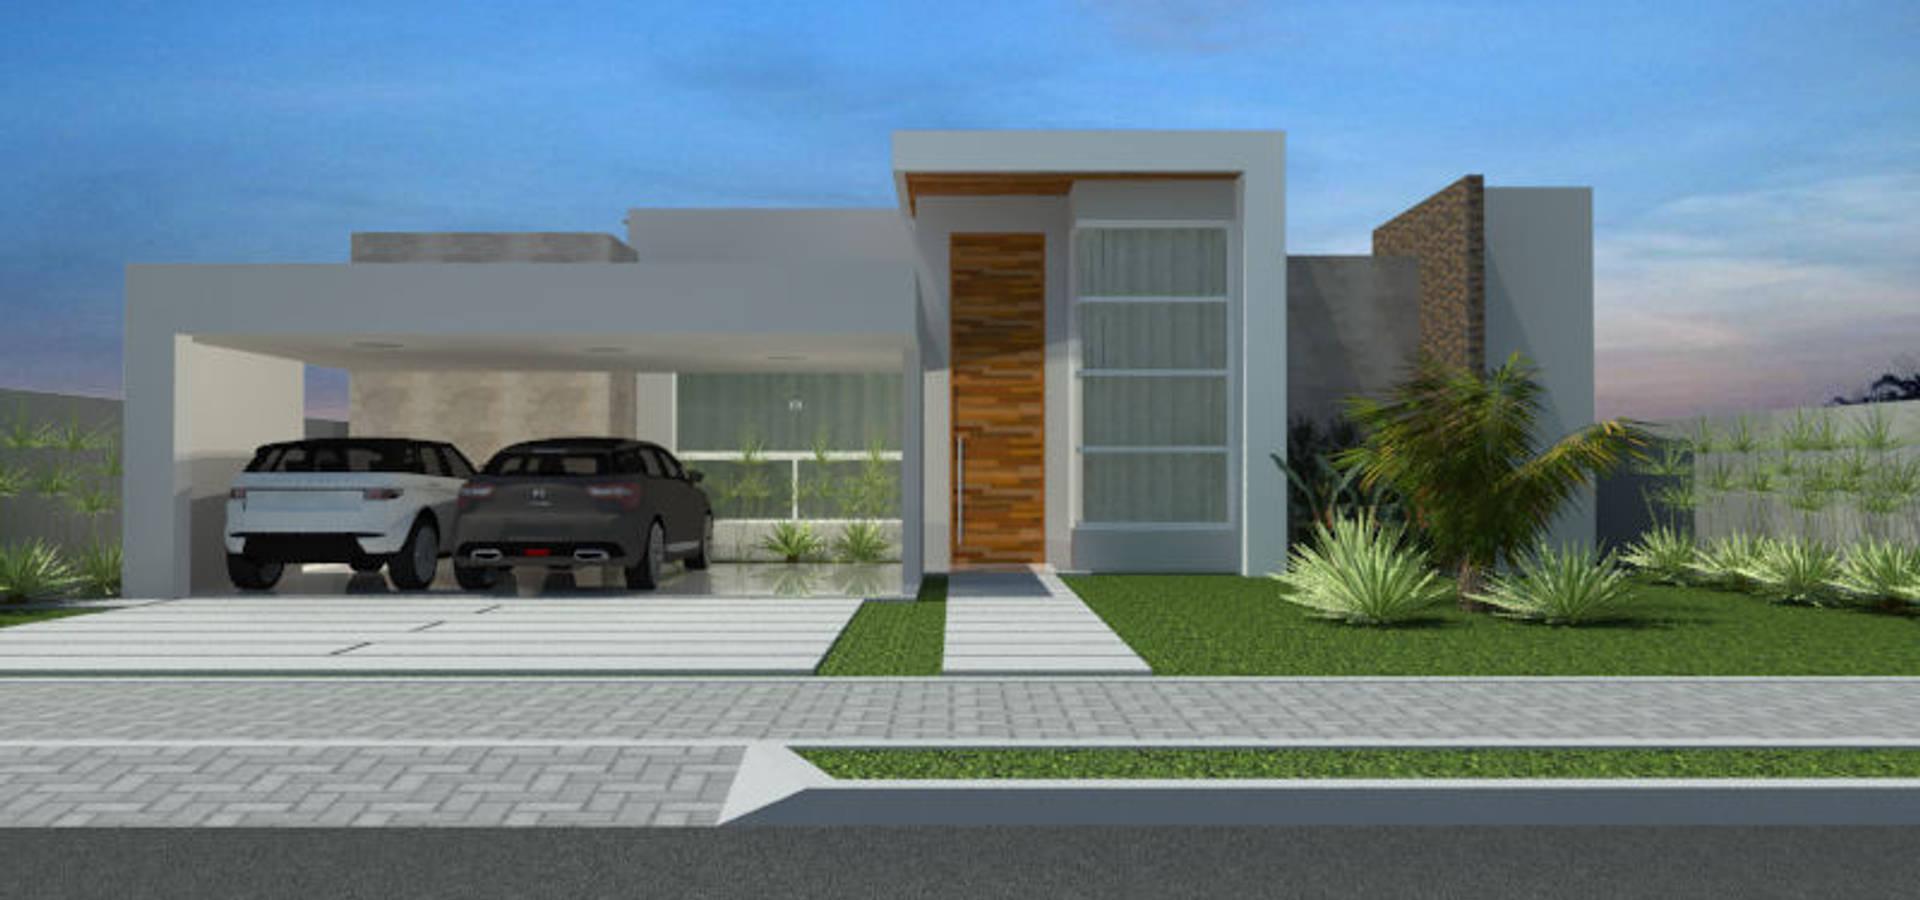 TreDonne Arquitetura